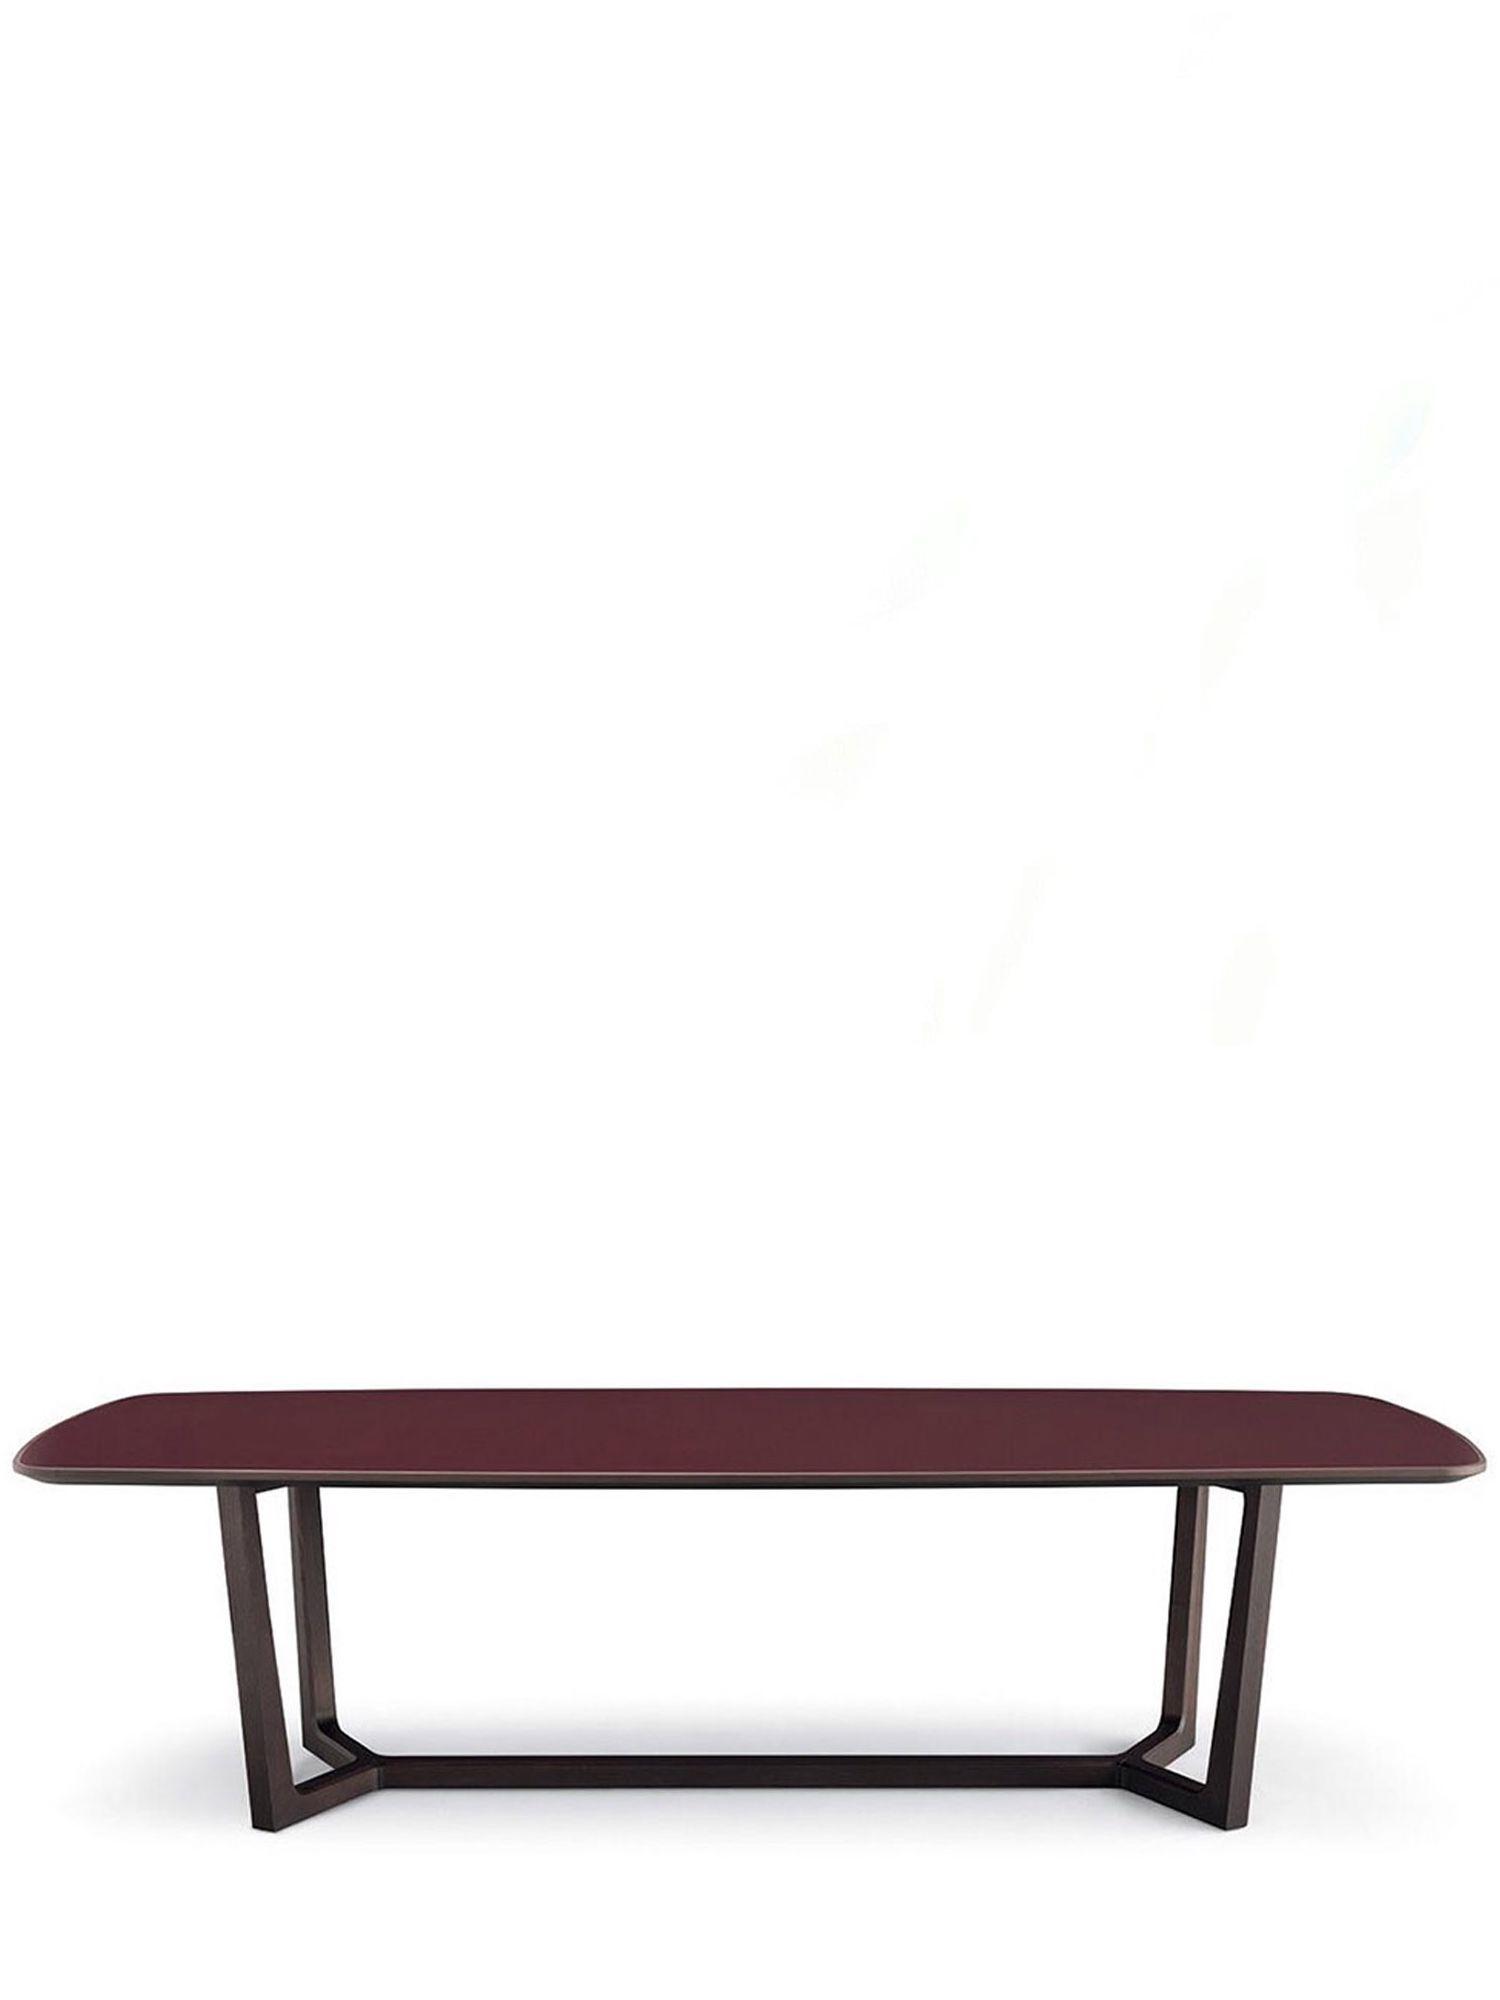 est living concorde table future classic 1